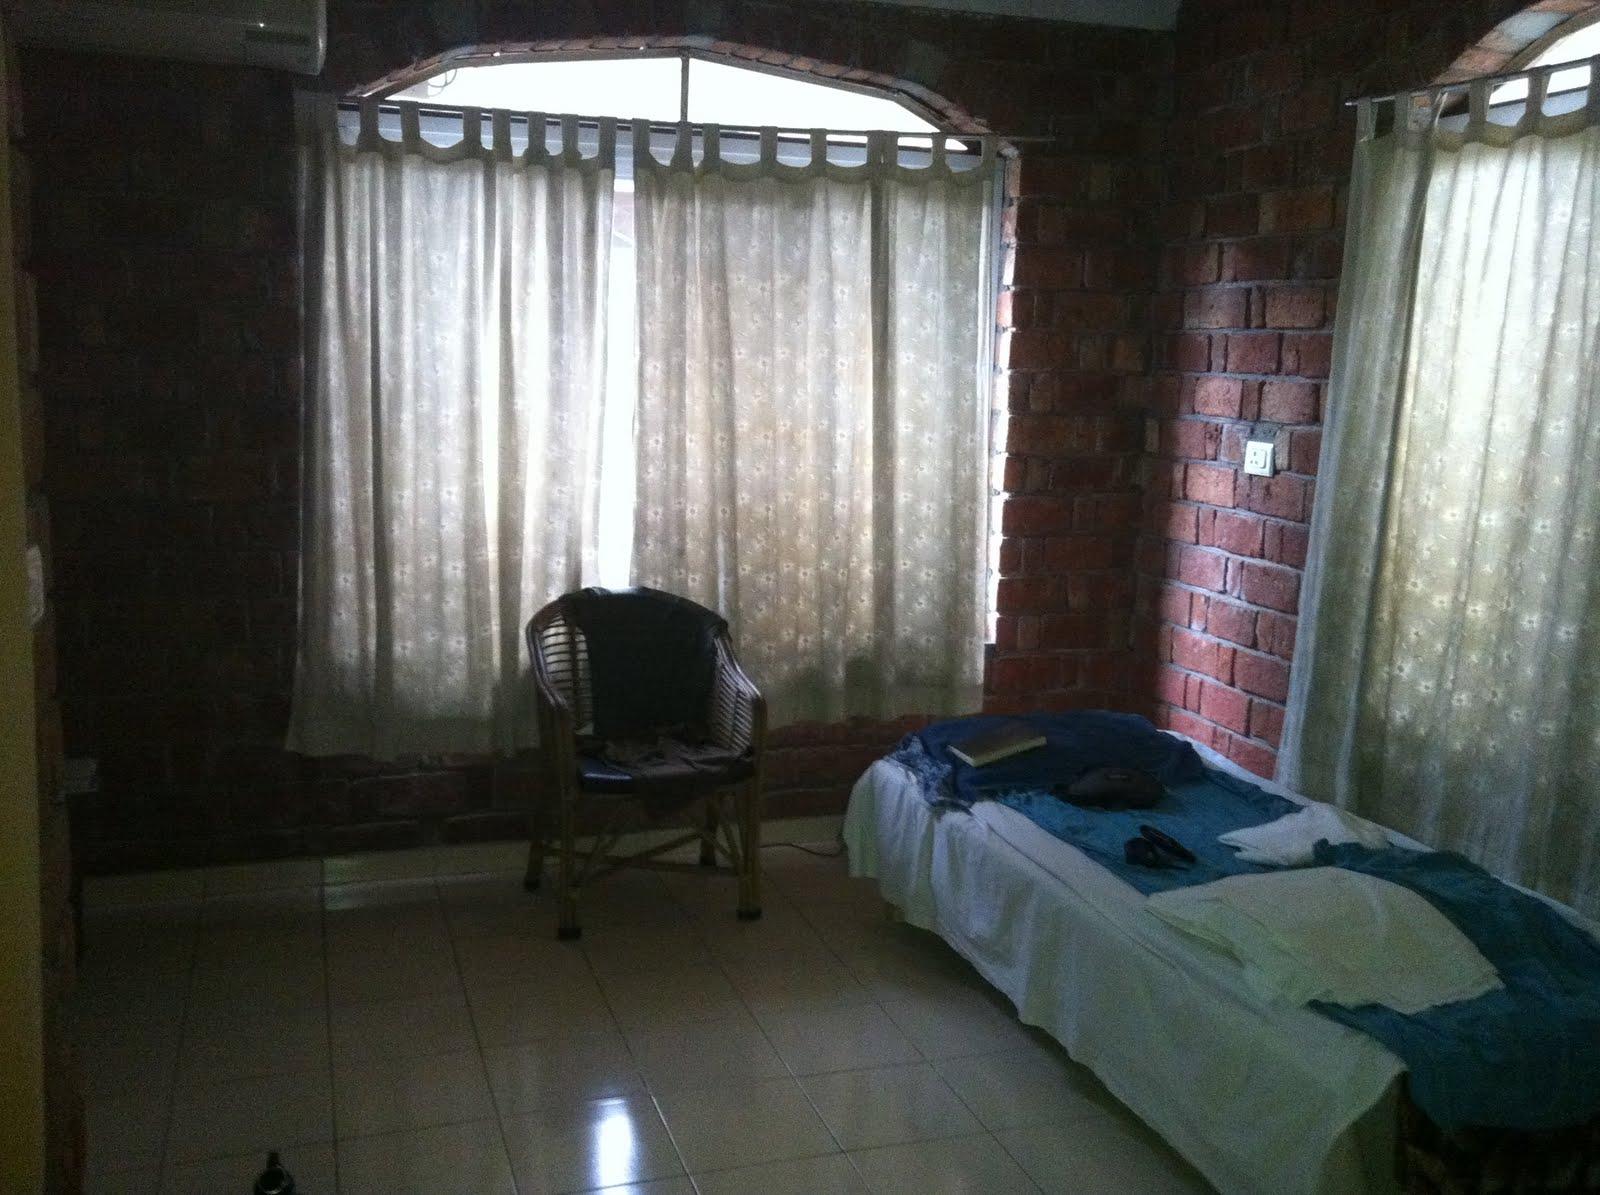 Swami Rama Sadhaka Grama Ashram rooms #384C5B